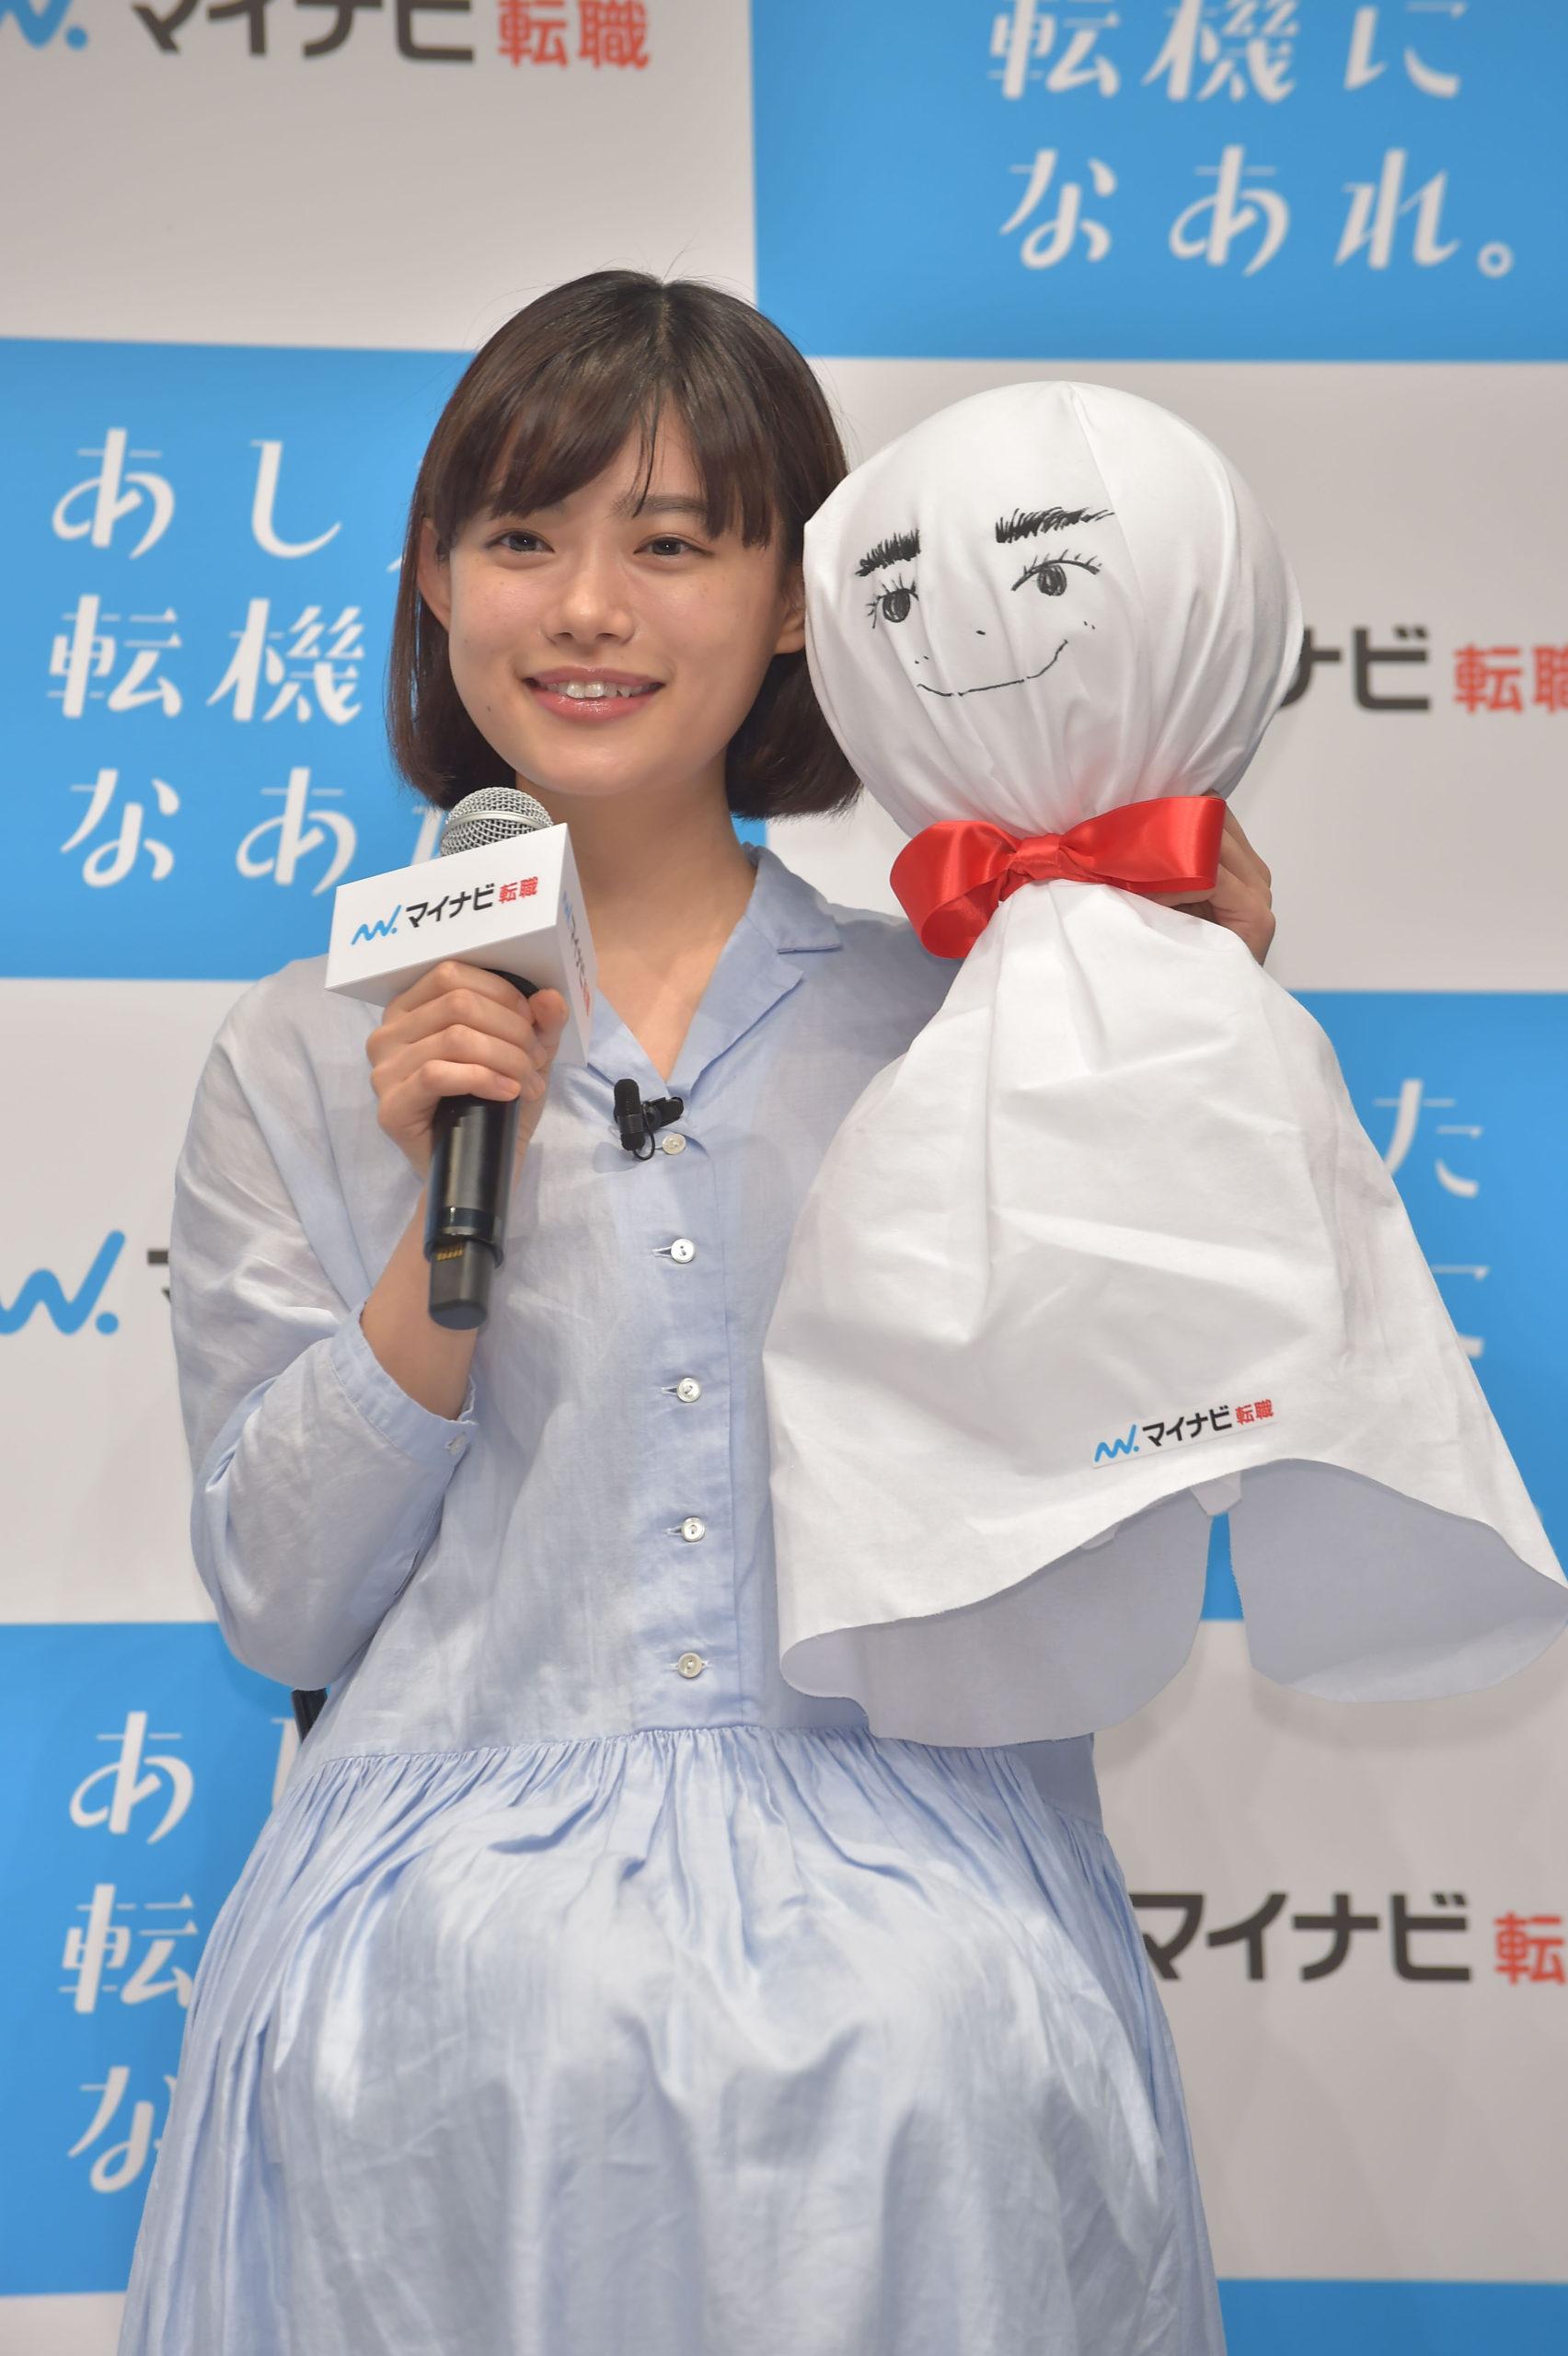 杉咲花(女優)/『マイナビ転職』新CM発表会(2020年1月8日)